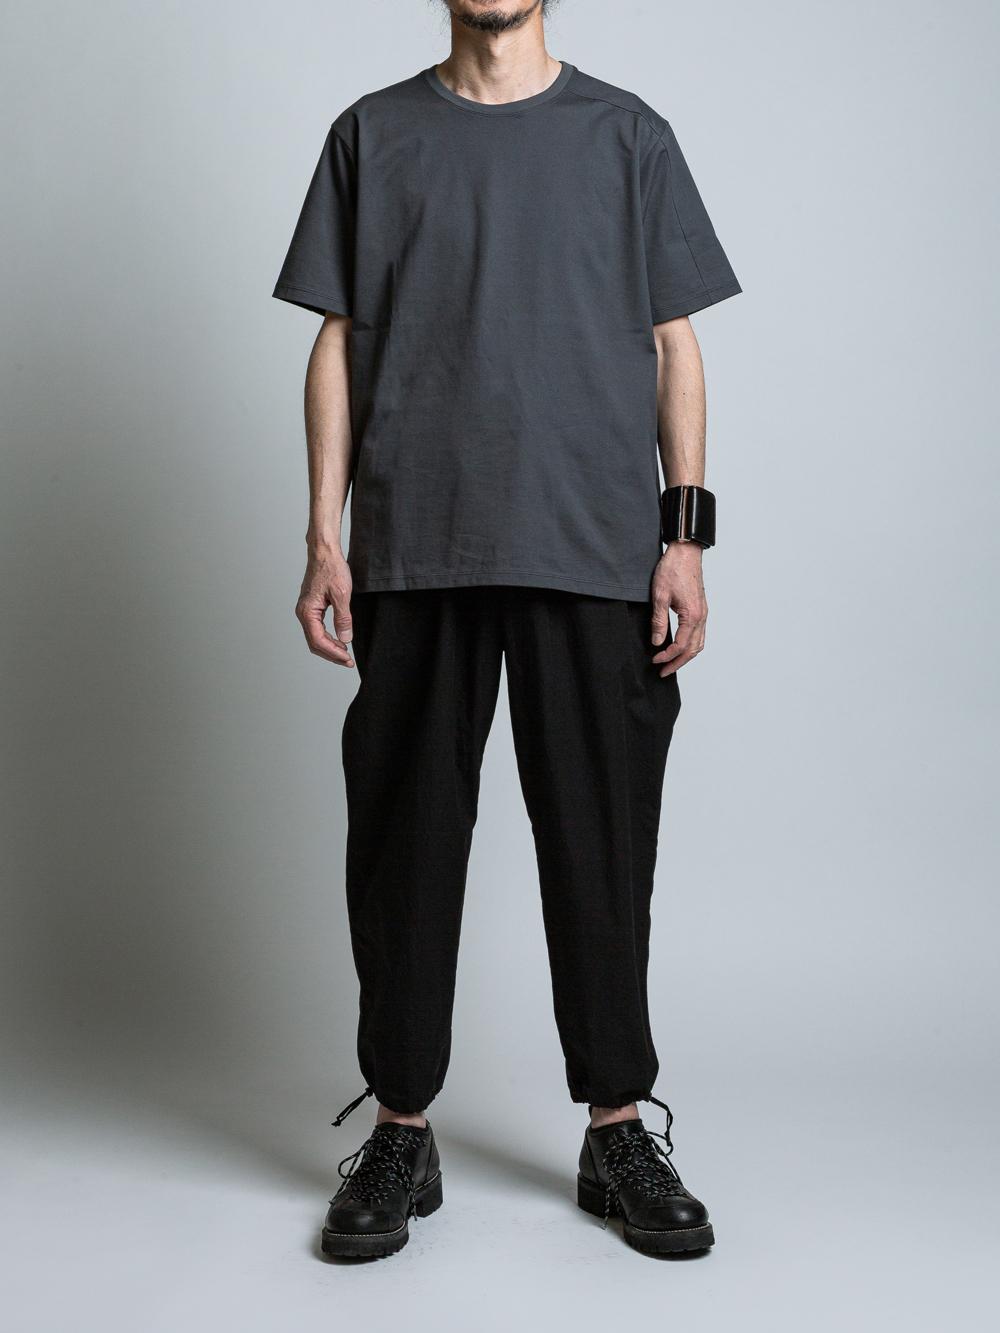 VI-SP-065-01 / 2枚パックTシャツ BLACK×GRAY